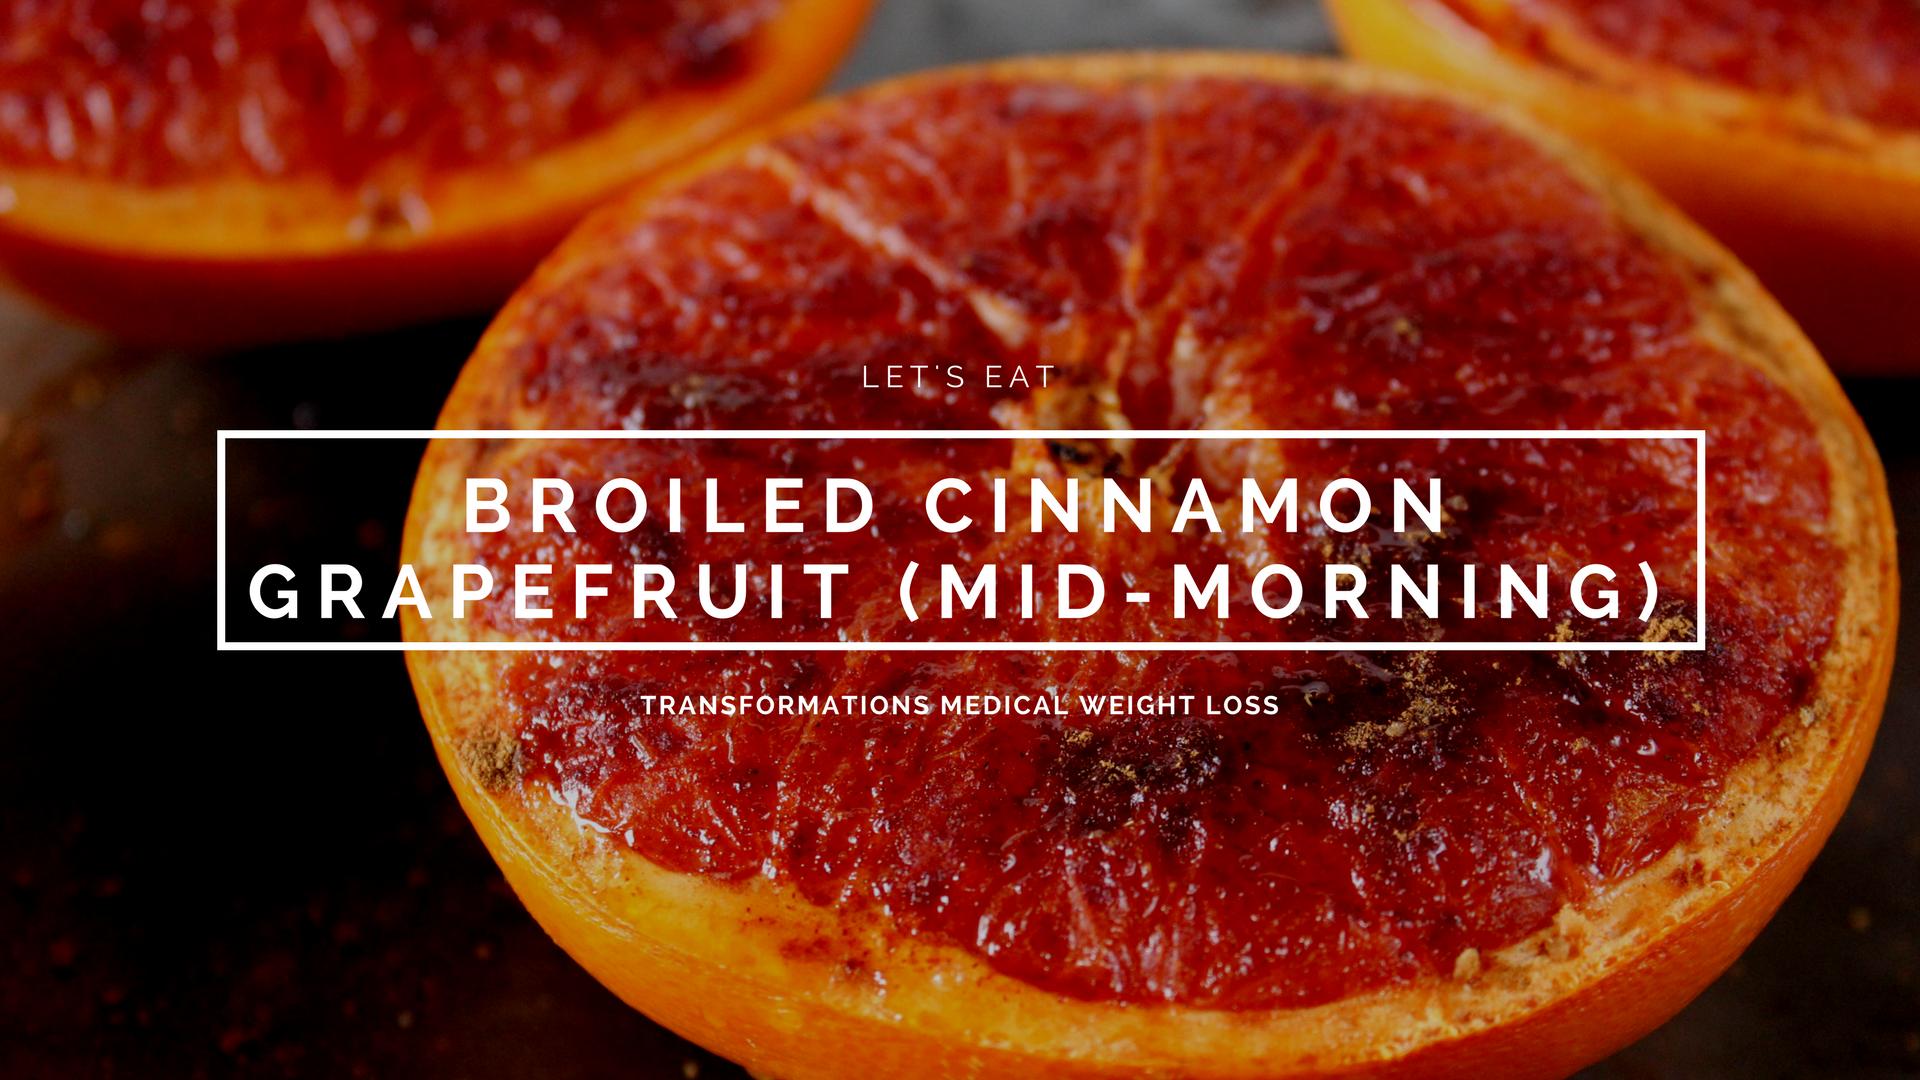 Broiled Cinnamon Grapefruit (Mid-Morning Snack)